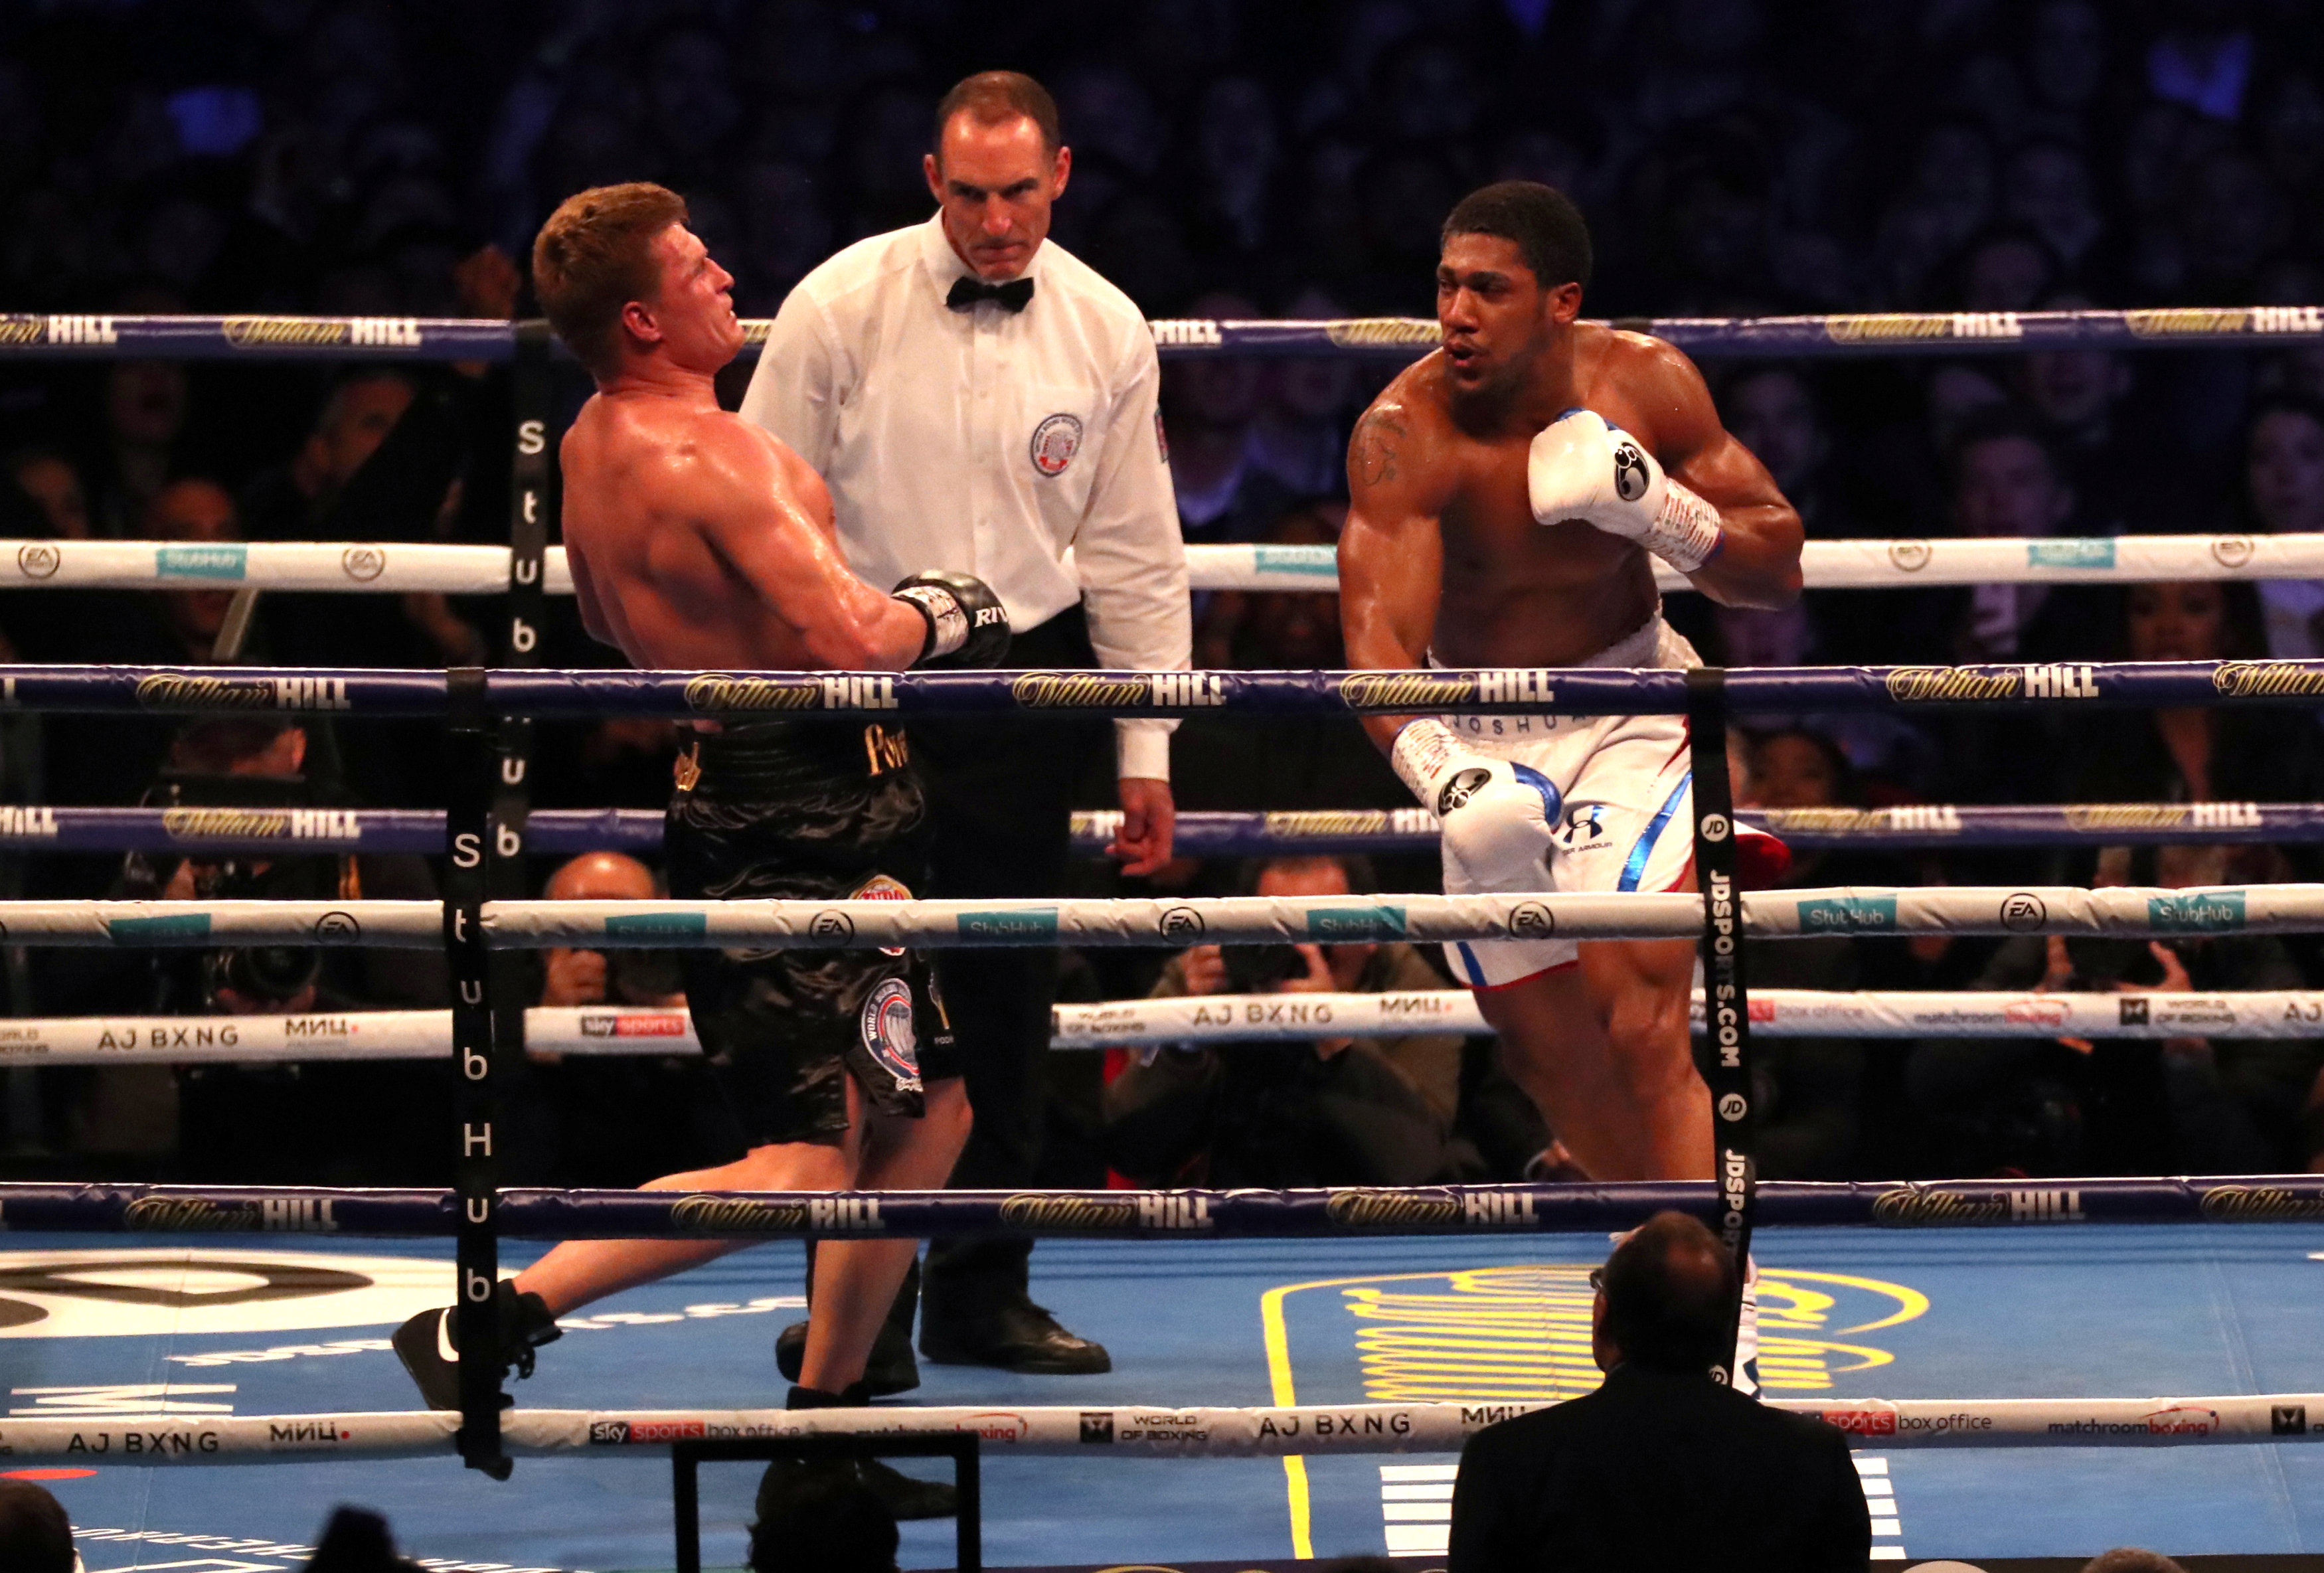 Boxe - Joshua met KO Povetkin au terme d'un combat grandiose